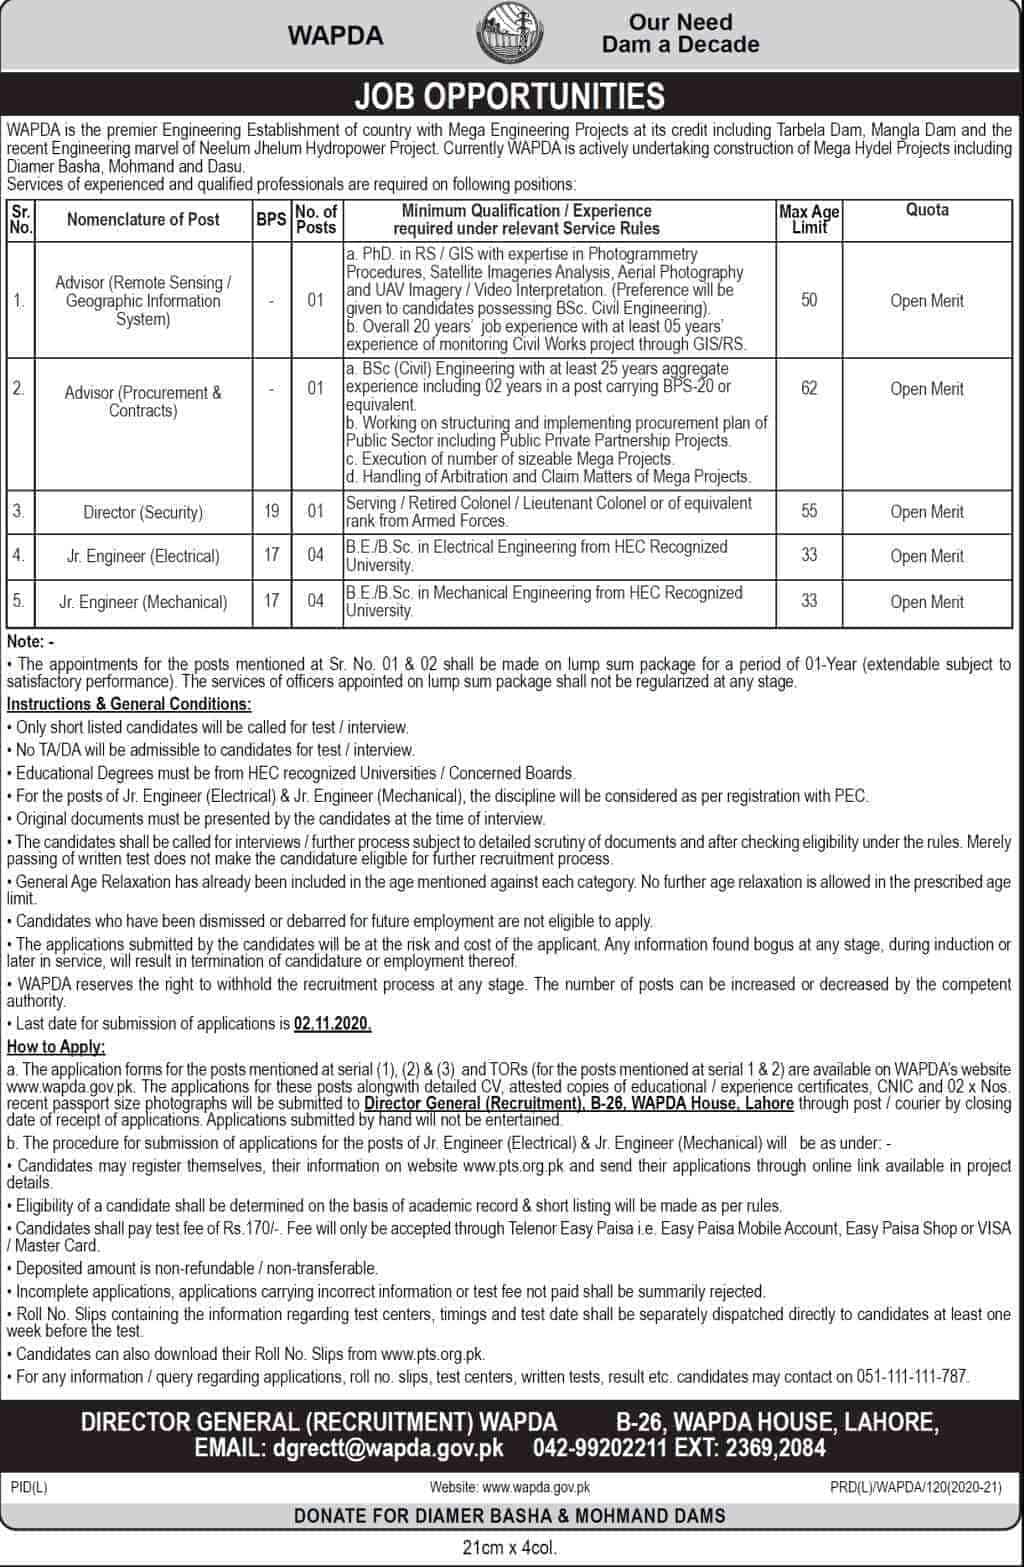 WAPDA jobs 2020 Latest Via PTS apply online